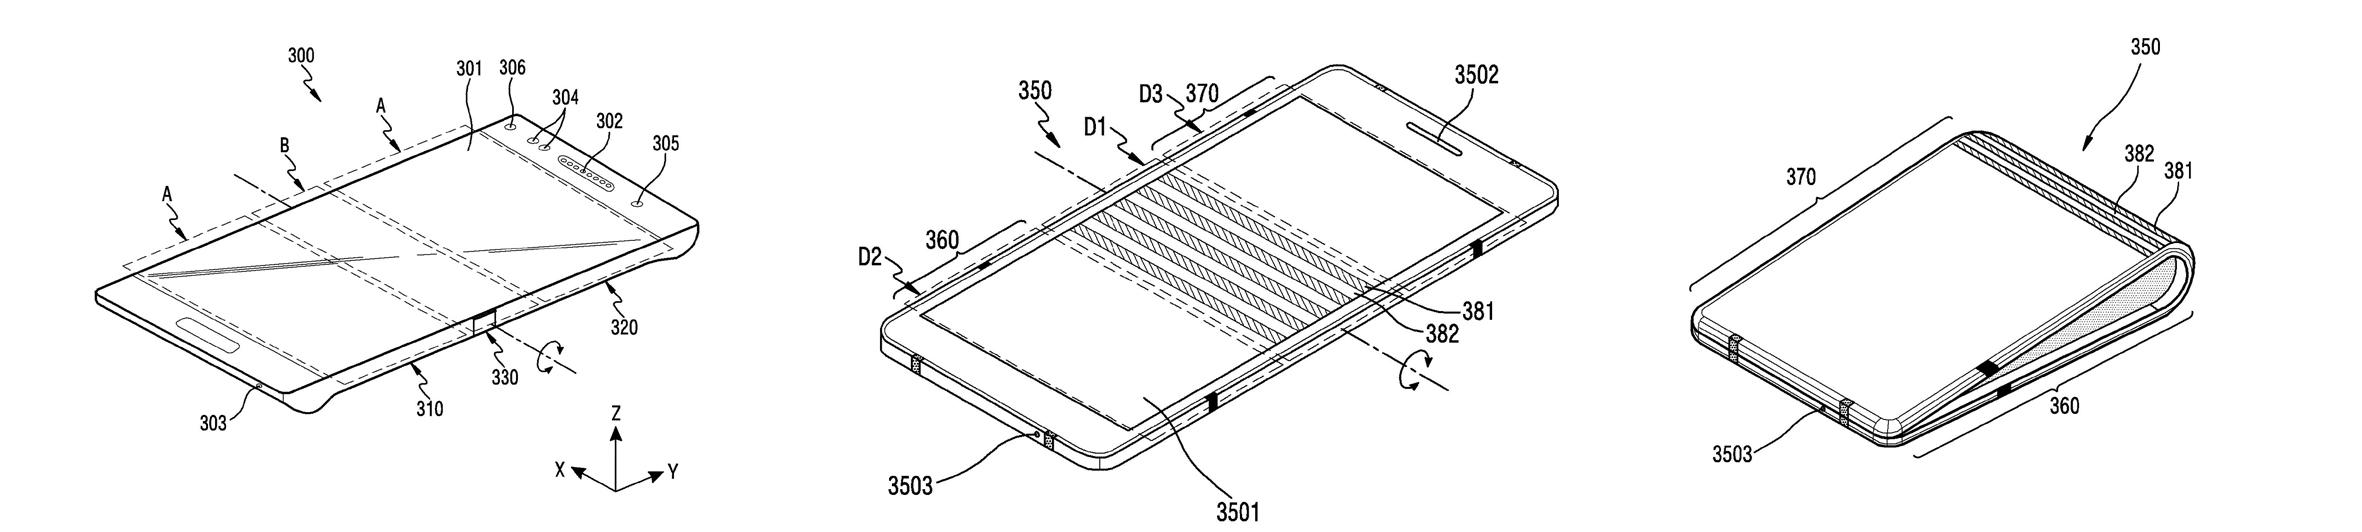 Samsung foldable device WO2017135651